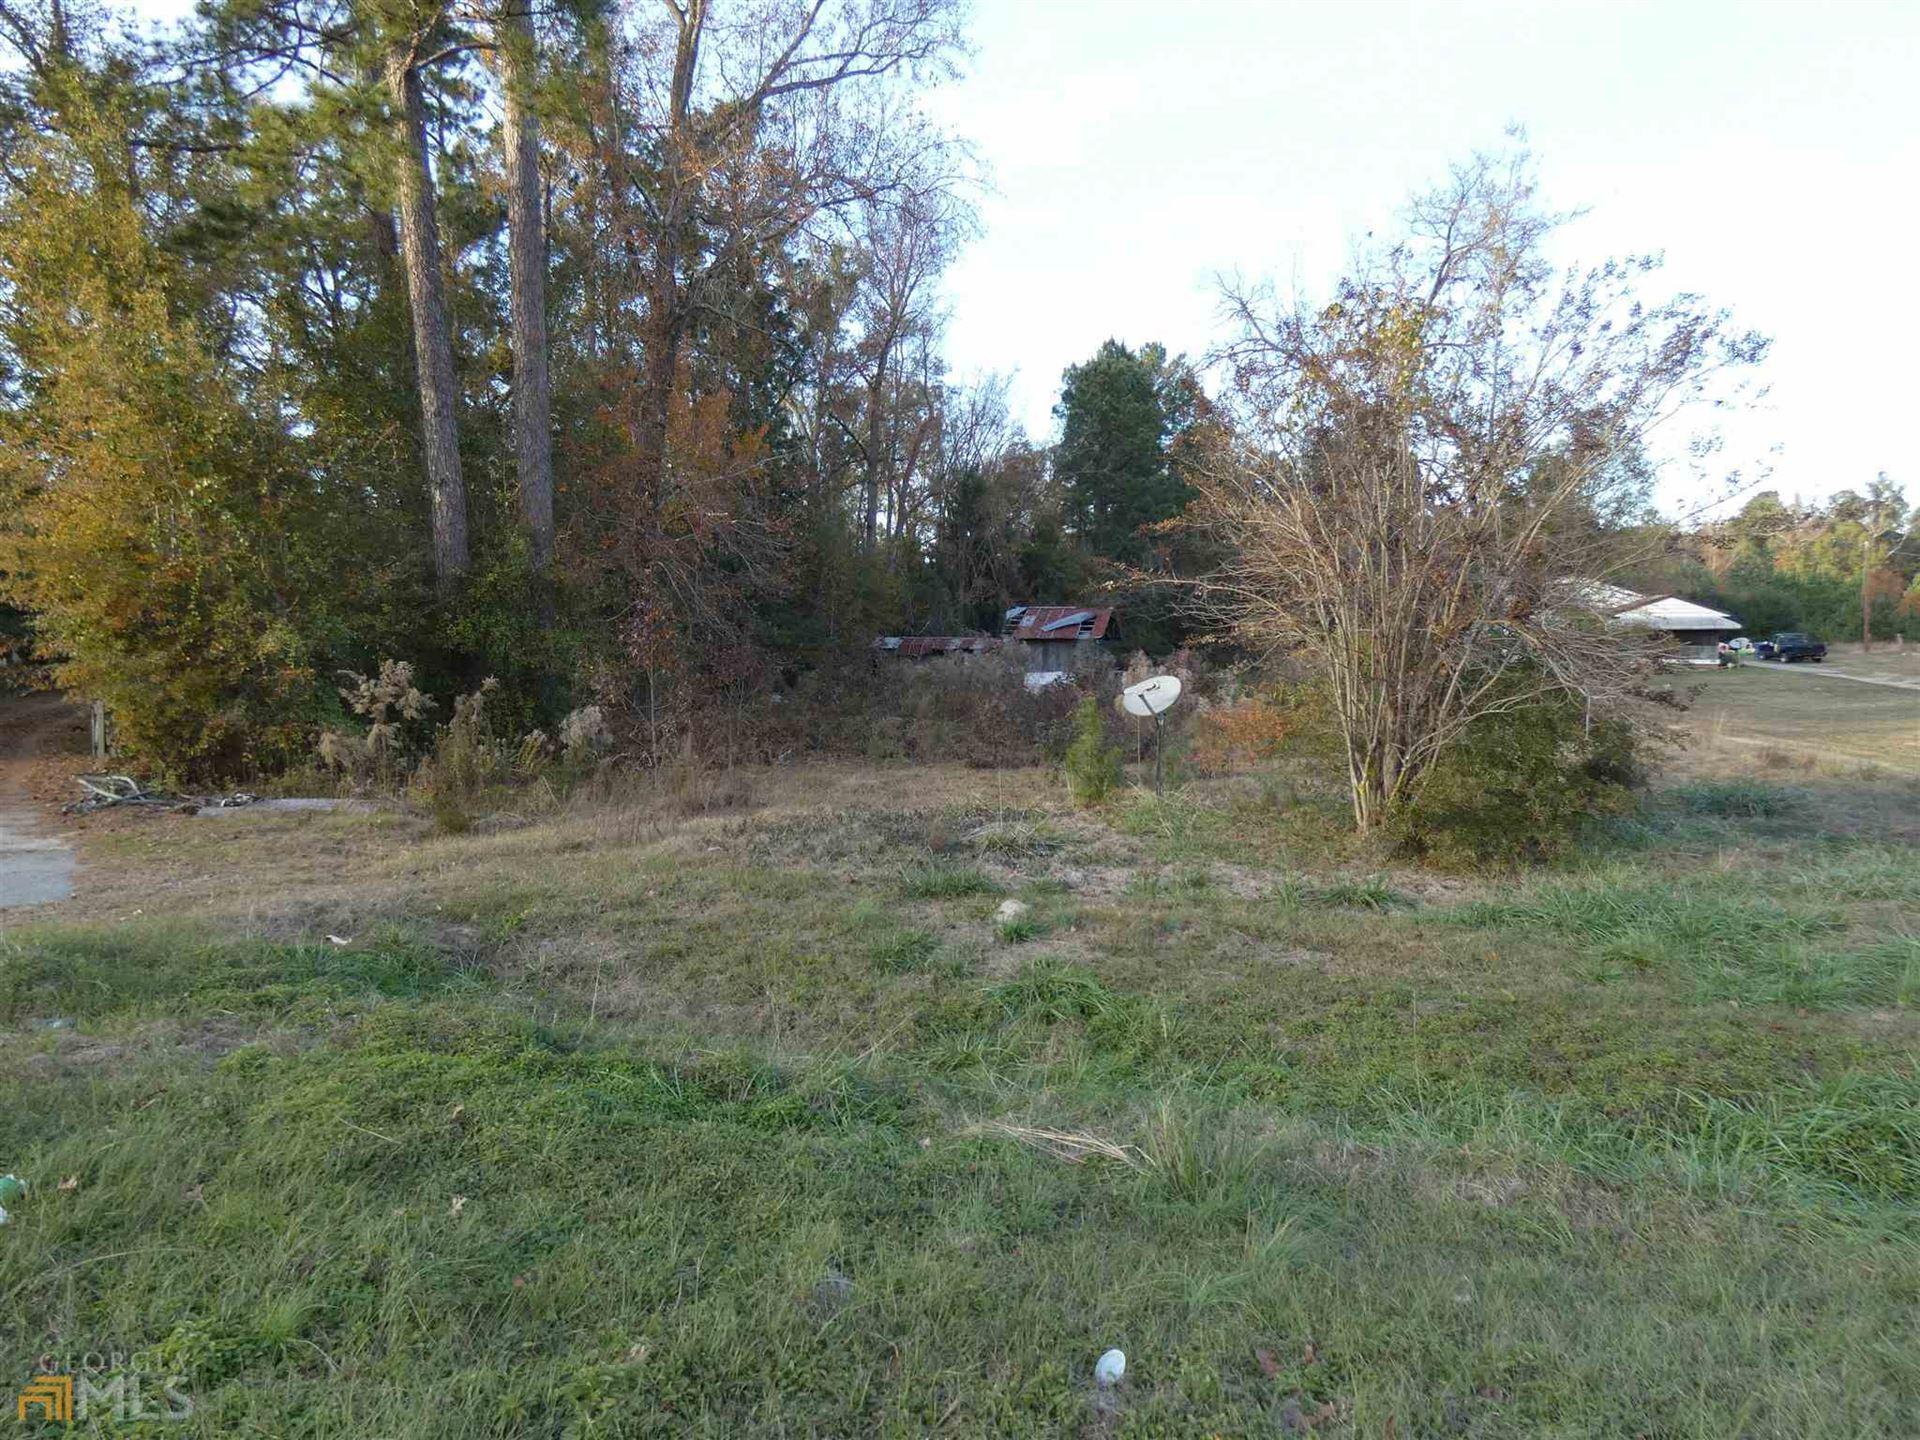 Photo of 849 E Mccarty St, Sandersville, GA 31082 (MLS # 8906221)